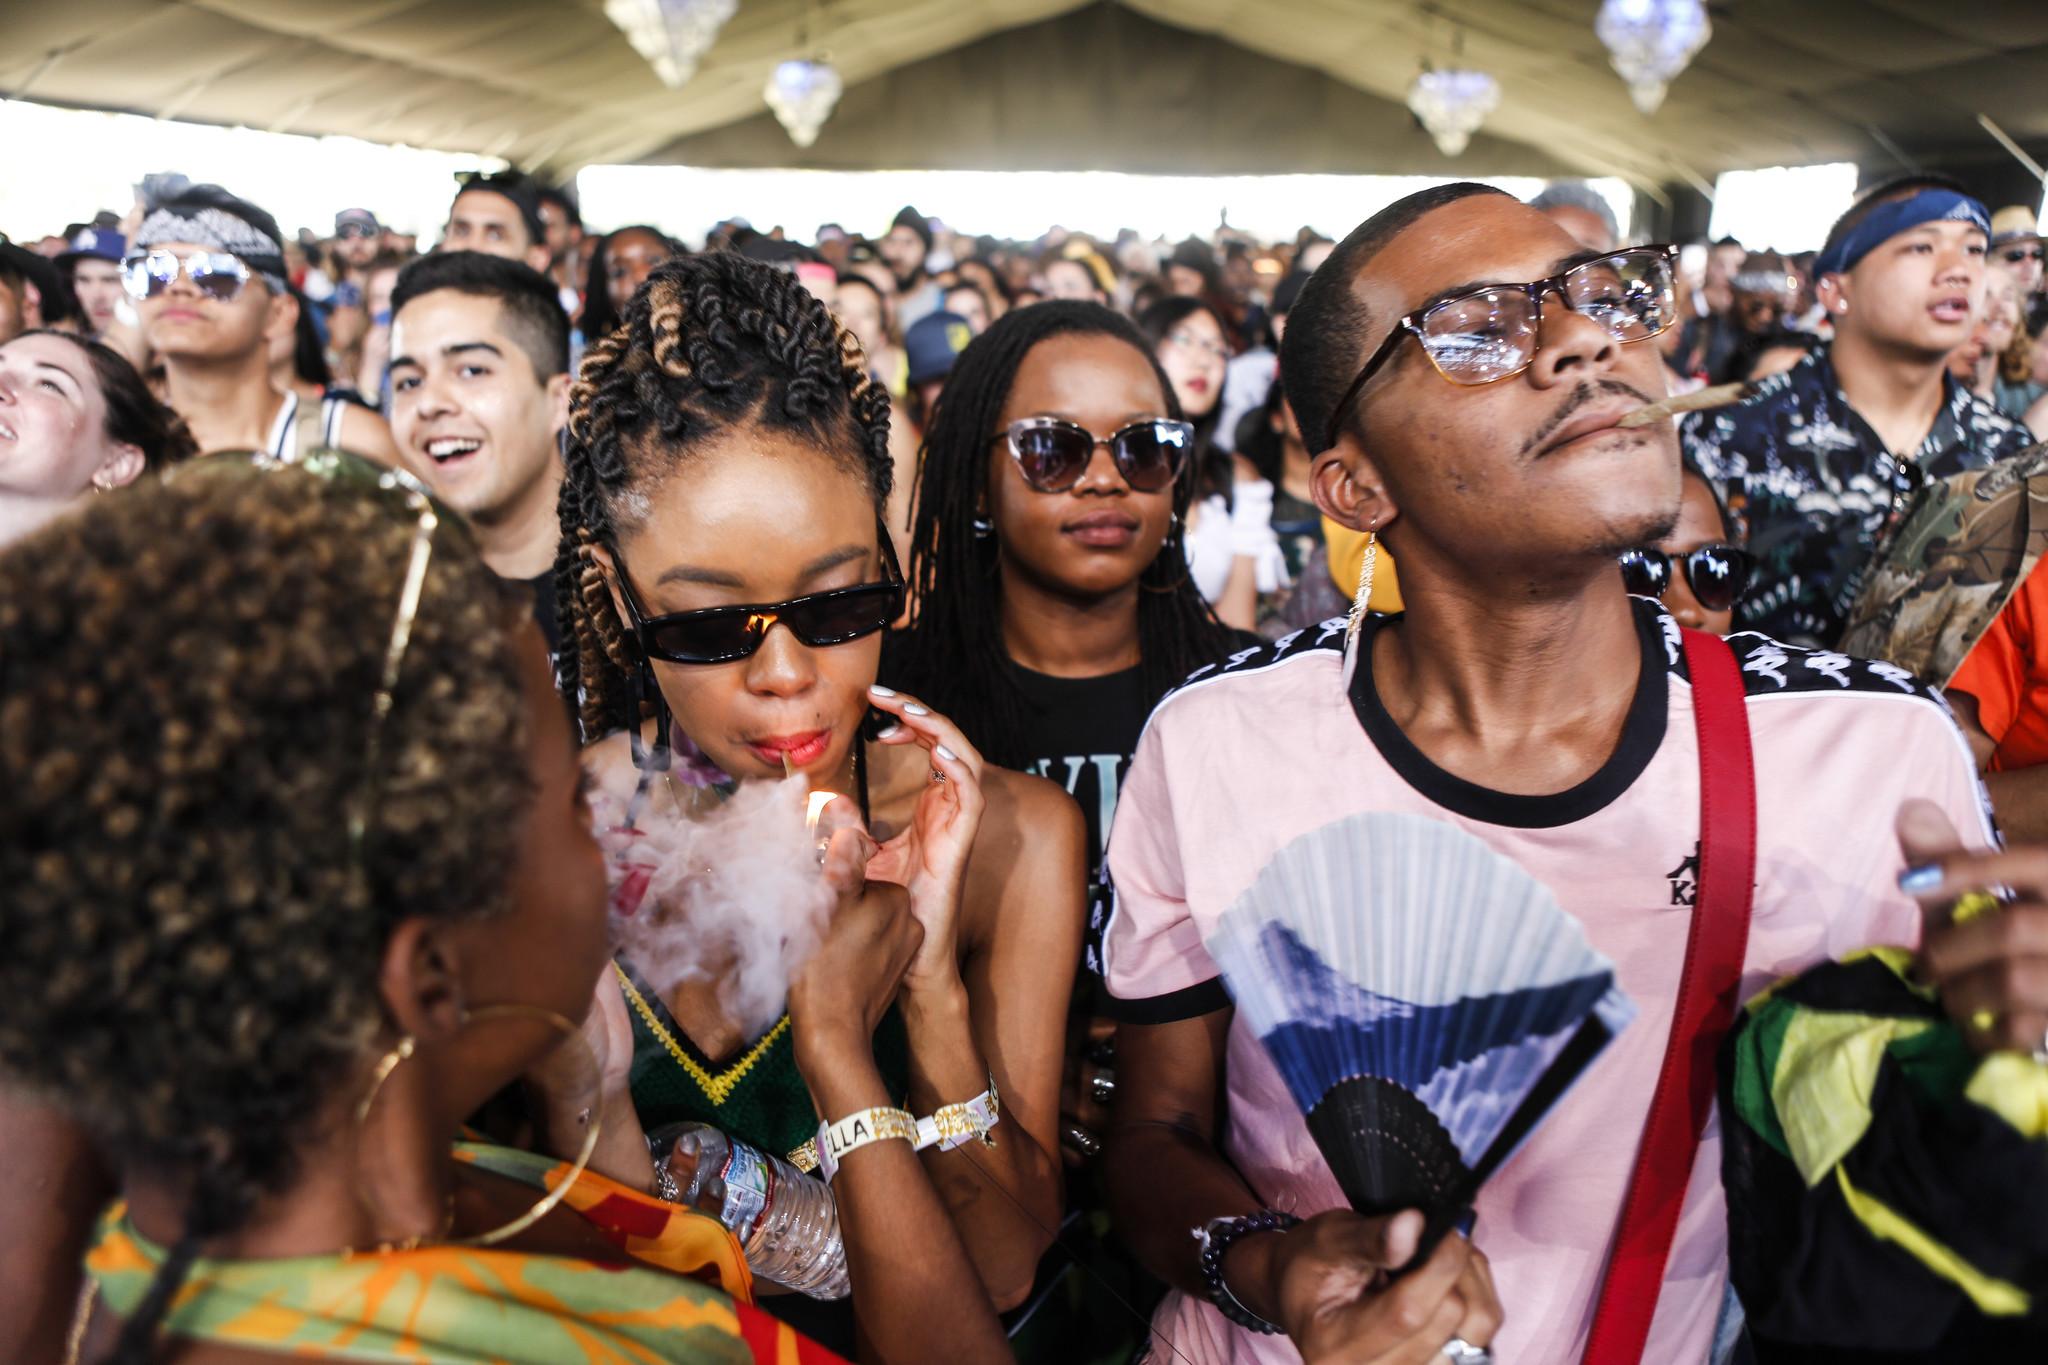 Fans enjoy the sounds of Kelela's performance at Coachella week two.